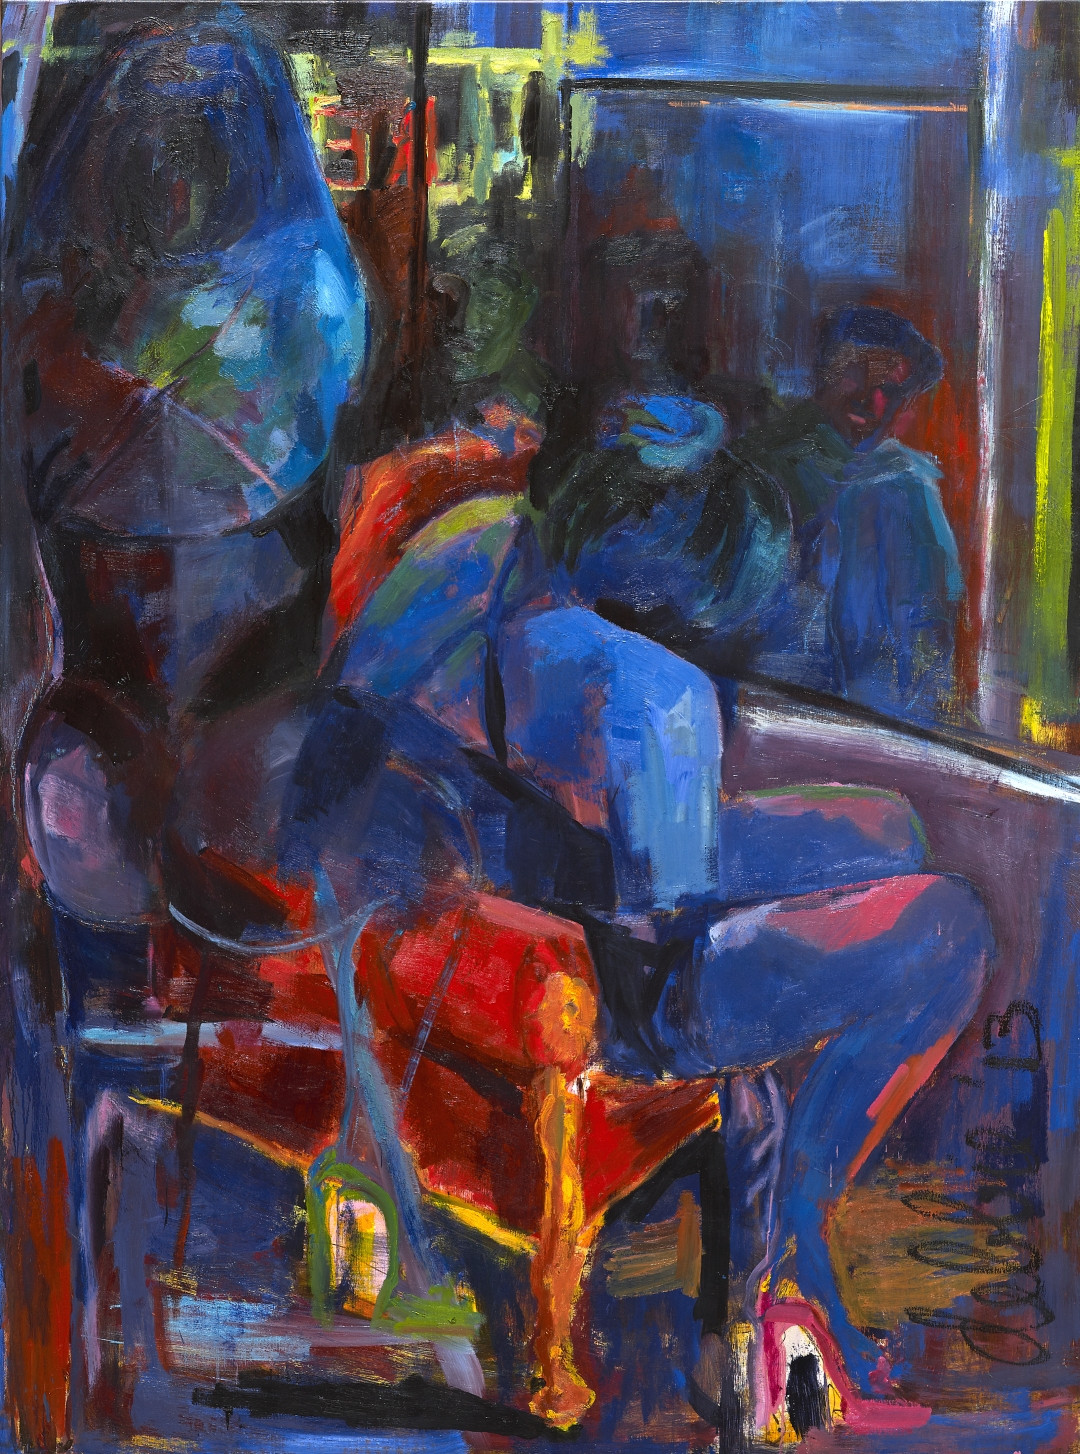 Window Prostitution - 2013 - oil on linen - 200 x 160 cm